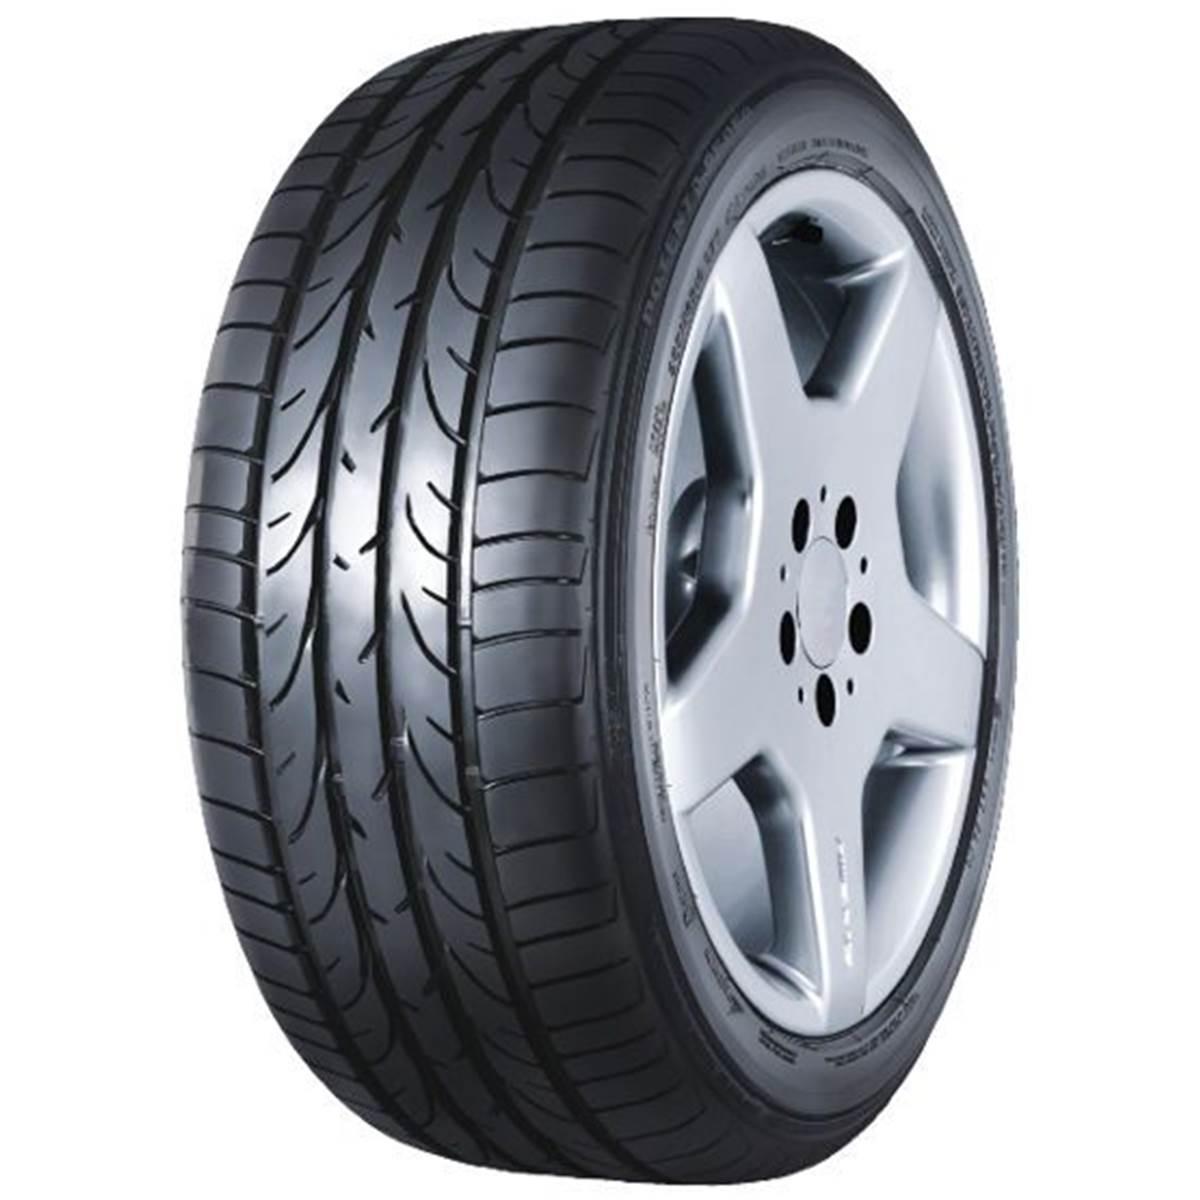 Pneu Bridgestone 225/50R17 94W Potenza Re050